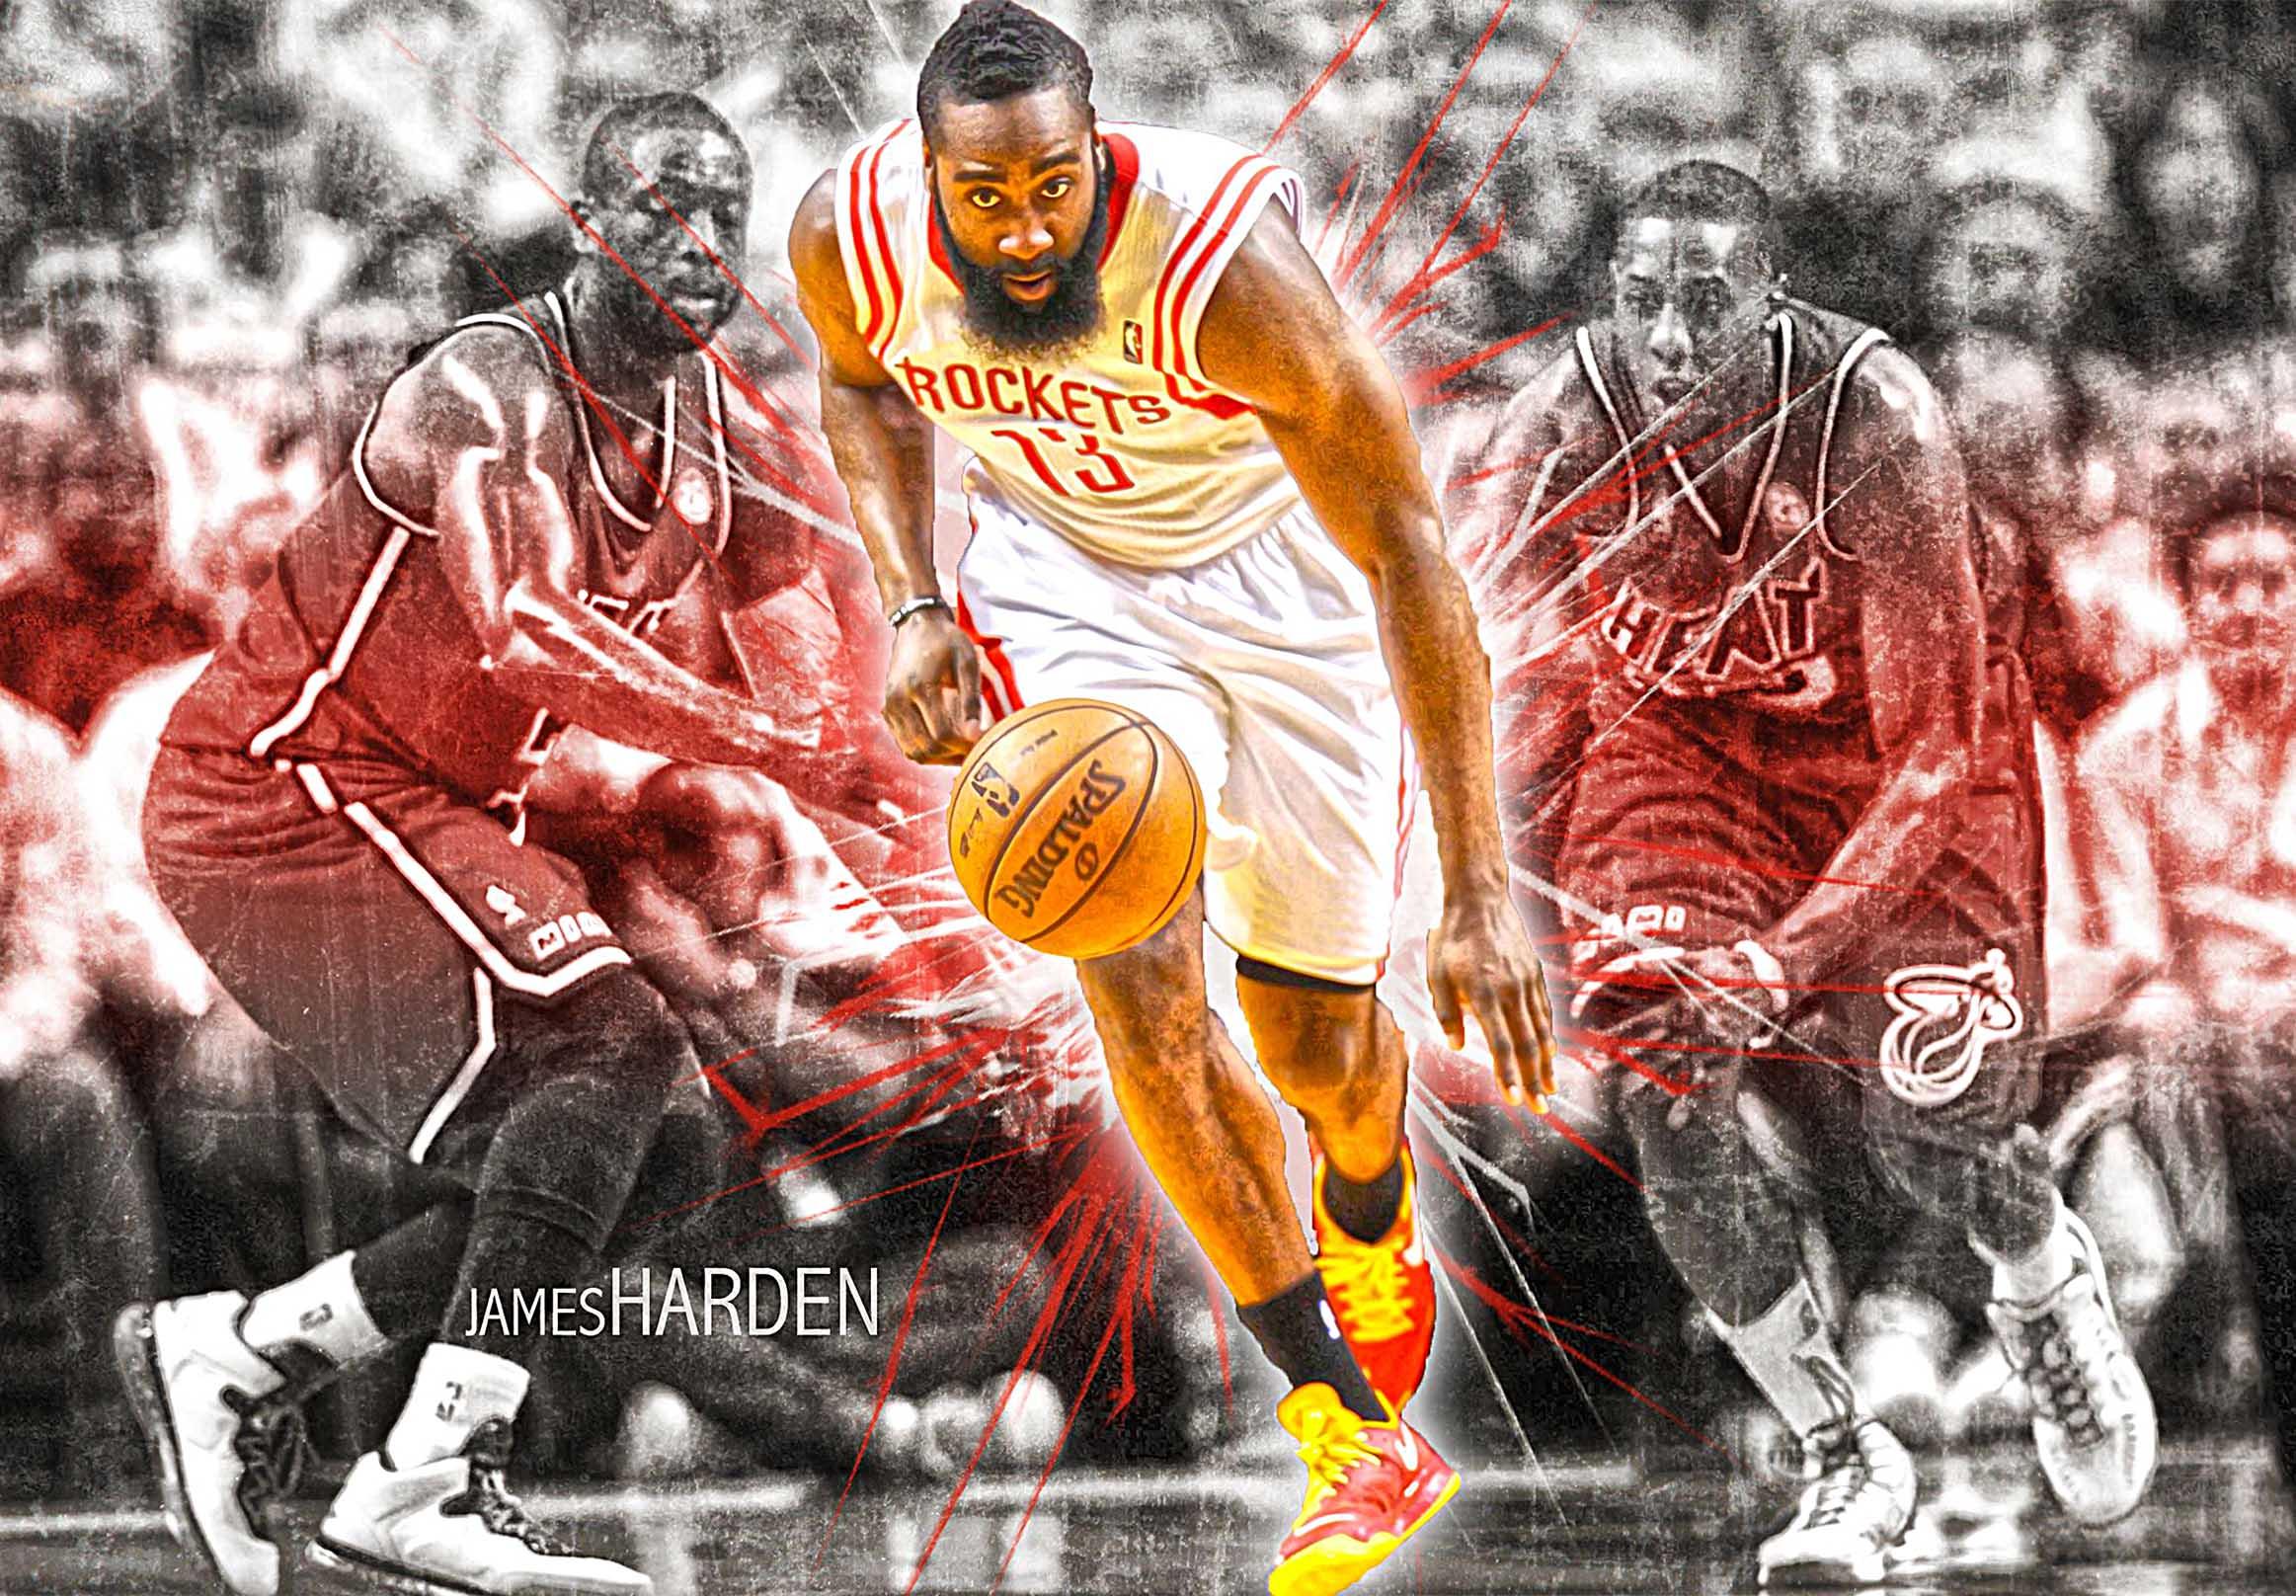 Houston Rockets James Harden Canvas Tablo (Nba-canvas-hardennew1)